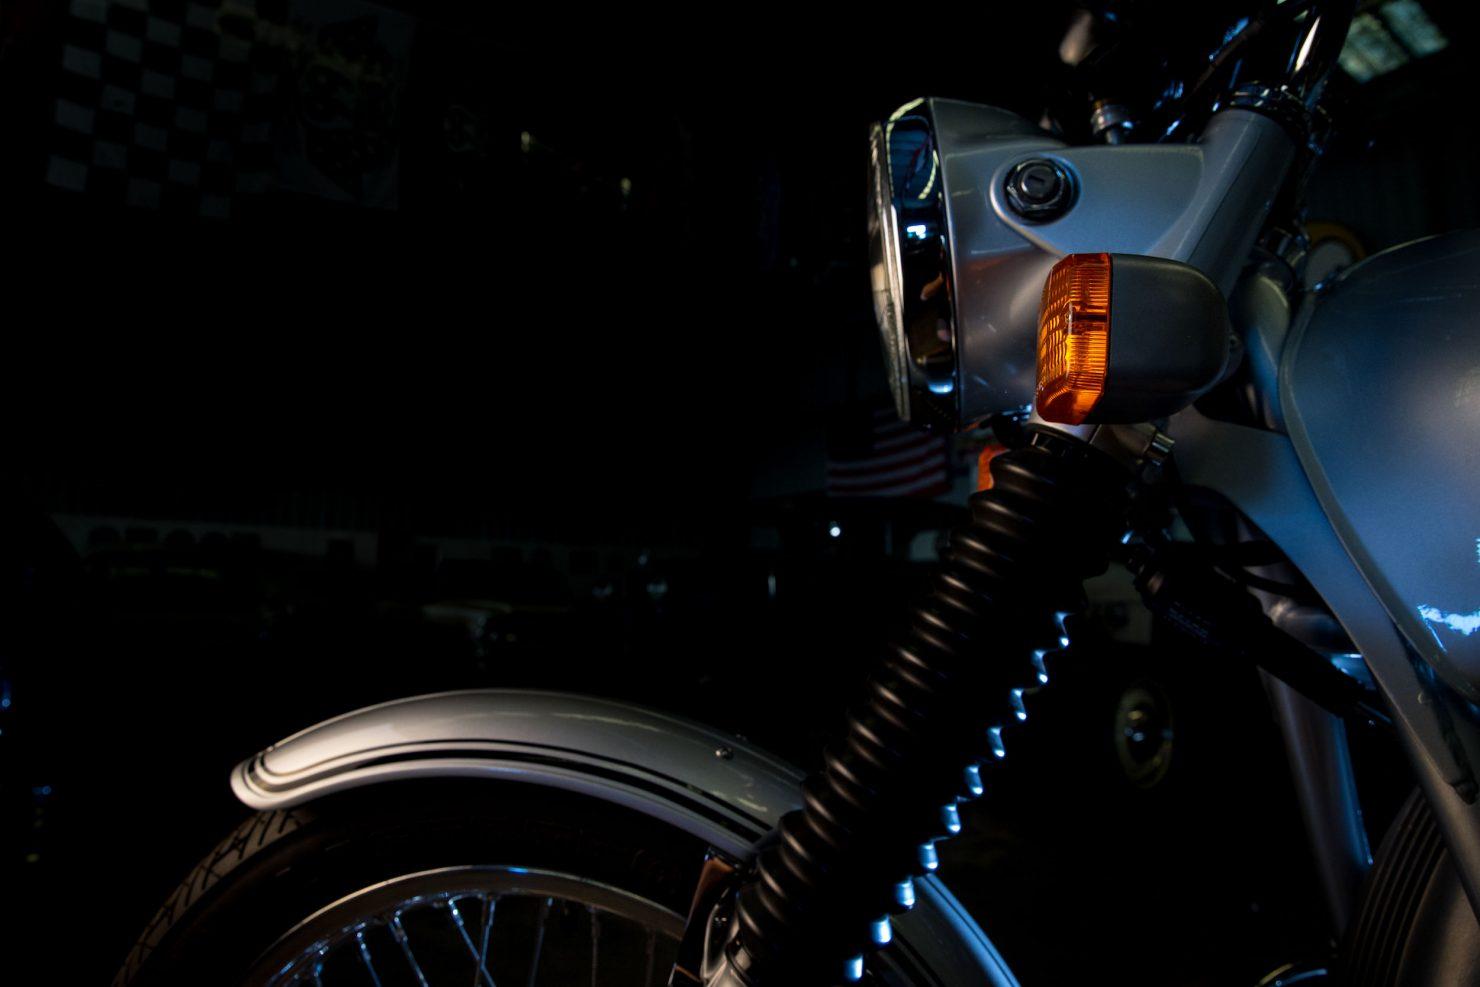 AM6P0461 1480x987 - Immaculately Restored: BMW R75/6